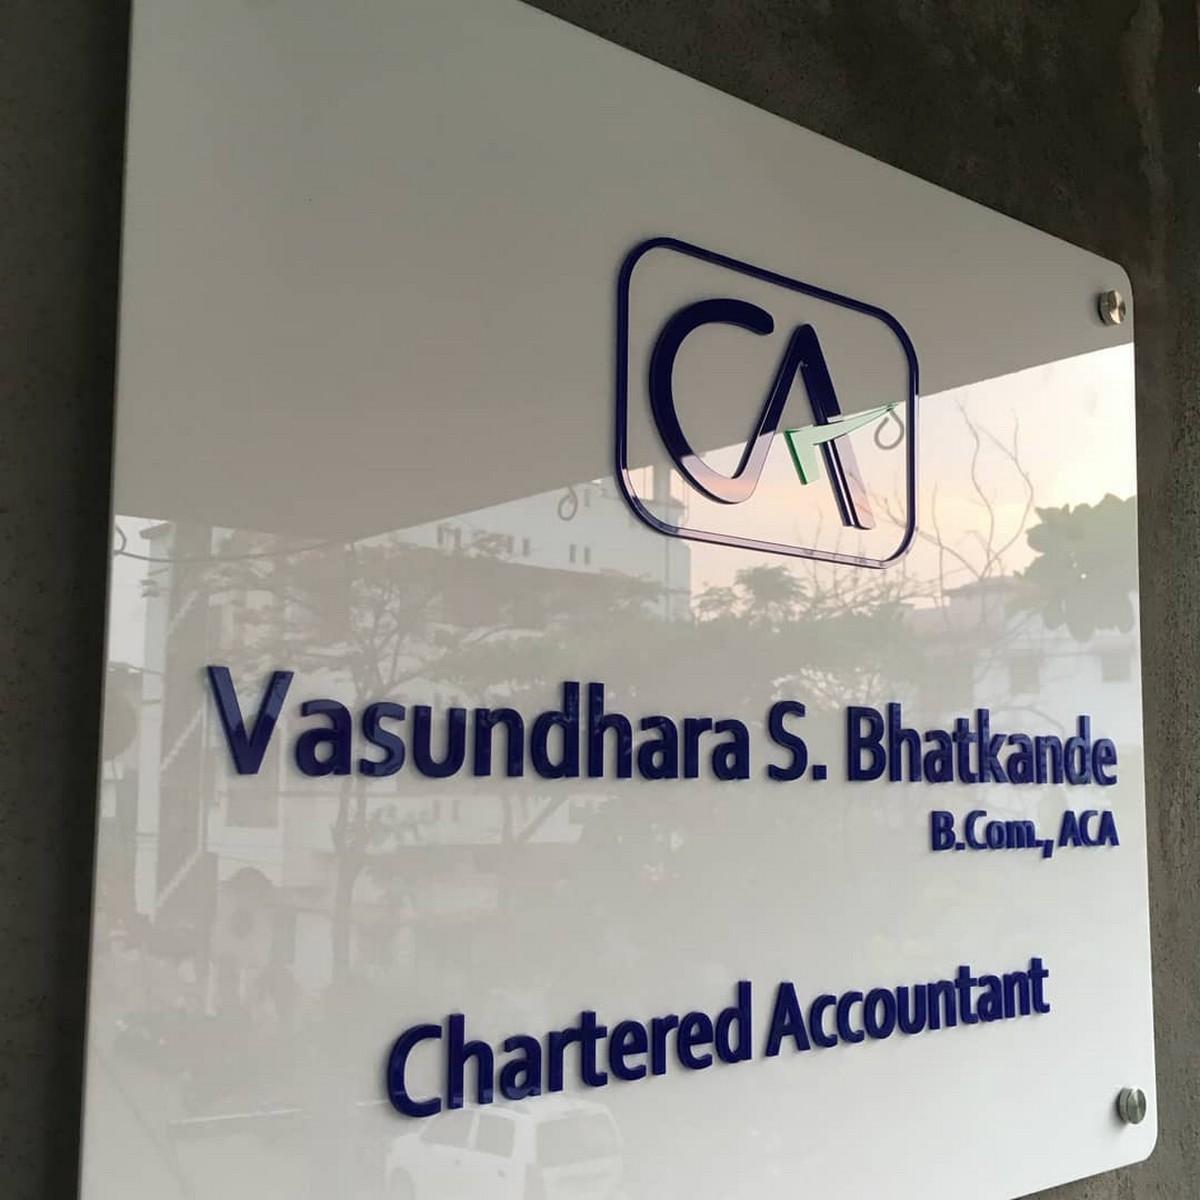 Chartered Accountant Acrylic Name Plate  Chartered Accountant Name Plate 2